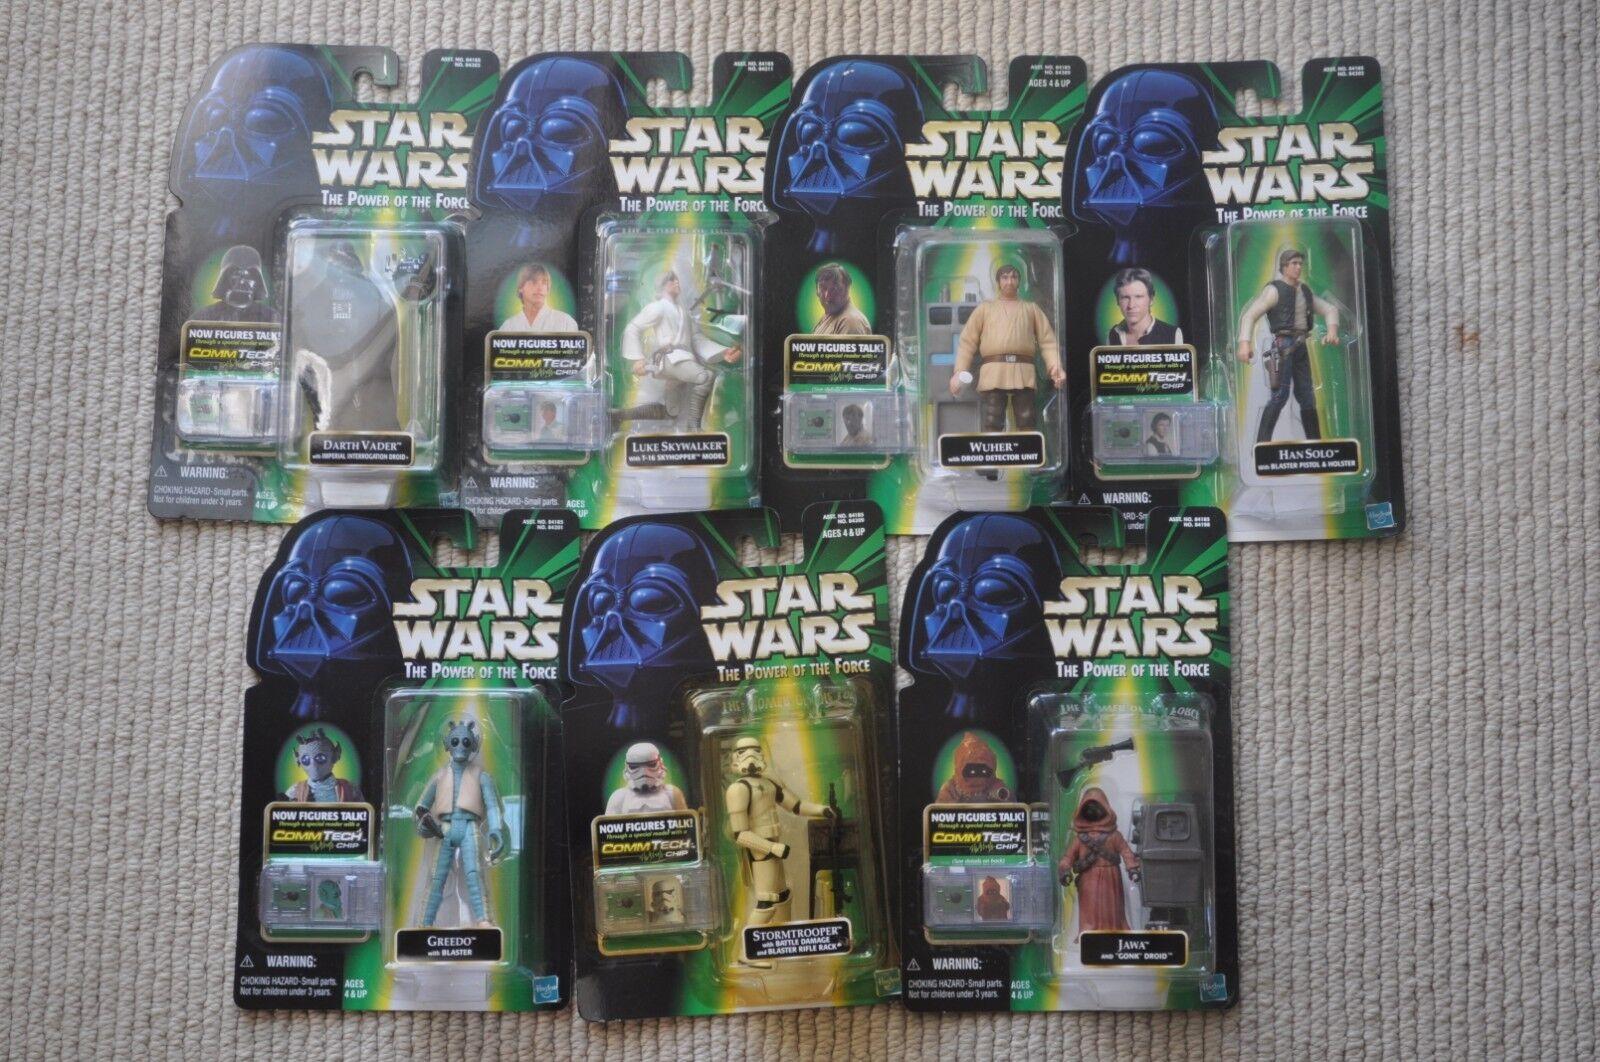 7 Star Wars POTF Commtech Wuher,Darth Vader,Greedo,Han,Stormtrooper,Jawa,Luke